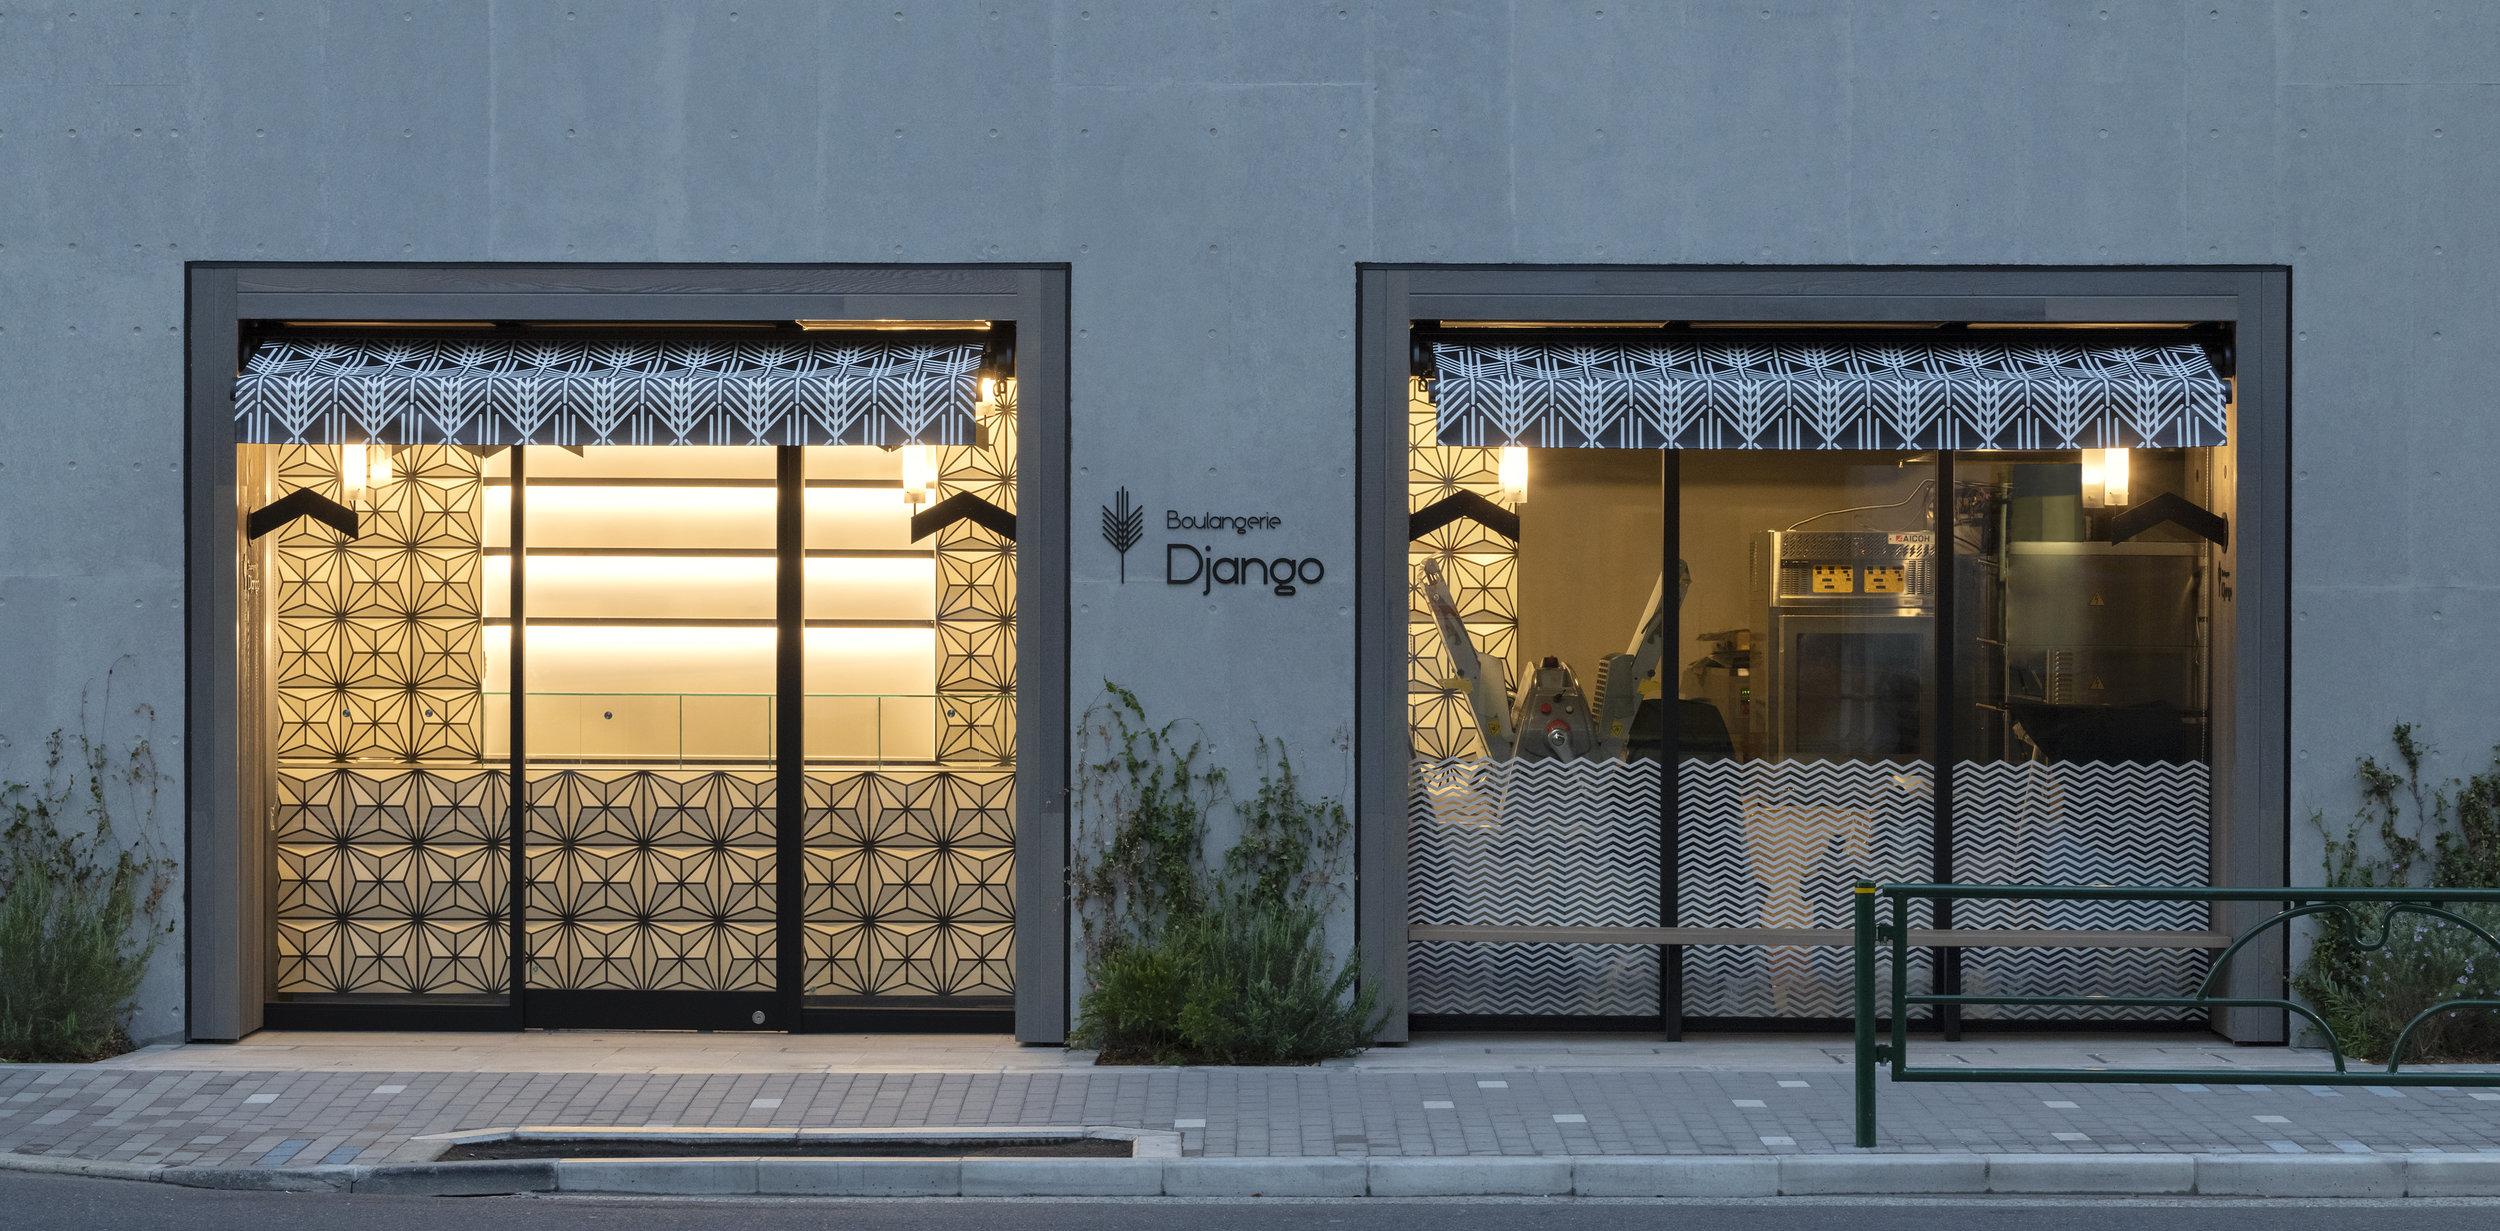 Boulangerie Django - Design by: ATELIER OPA + buildingLandscapeInterior Division: Retail DesignWebsite: http://www.atelier-opa.com